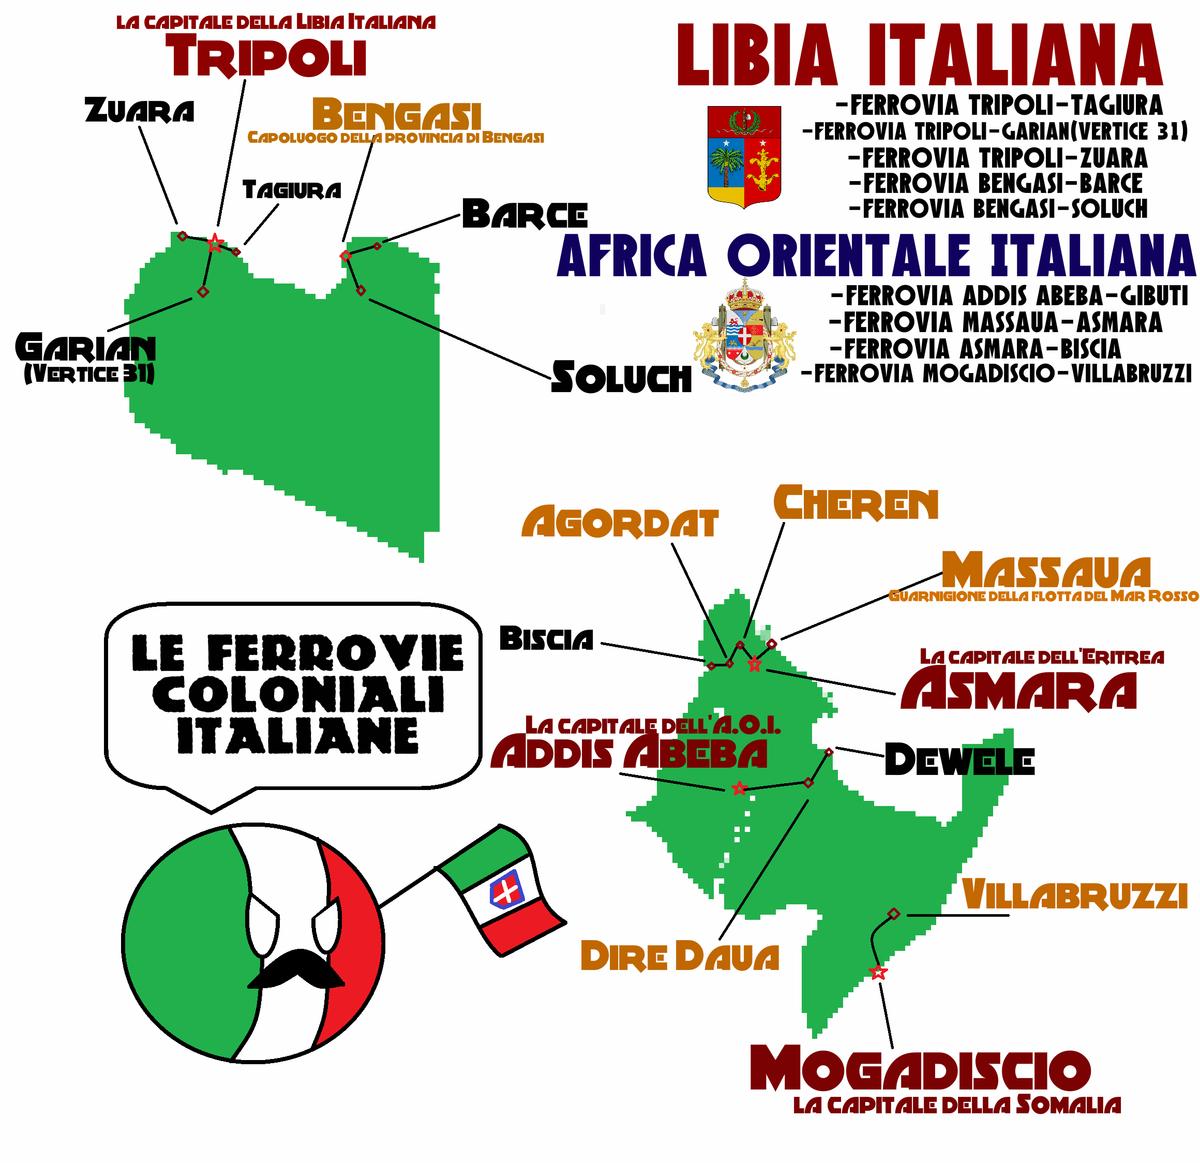 f:id:italianoluciano212:20190908230733j:plain